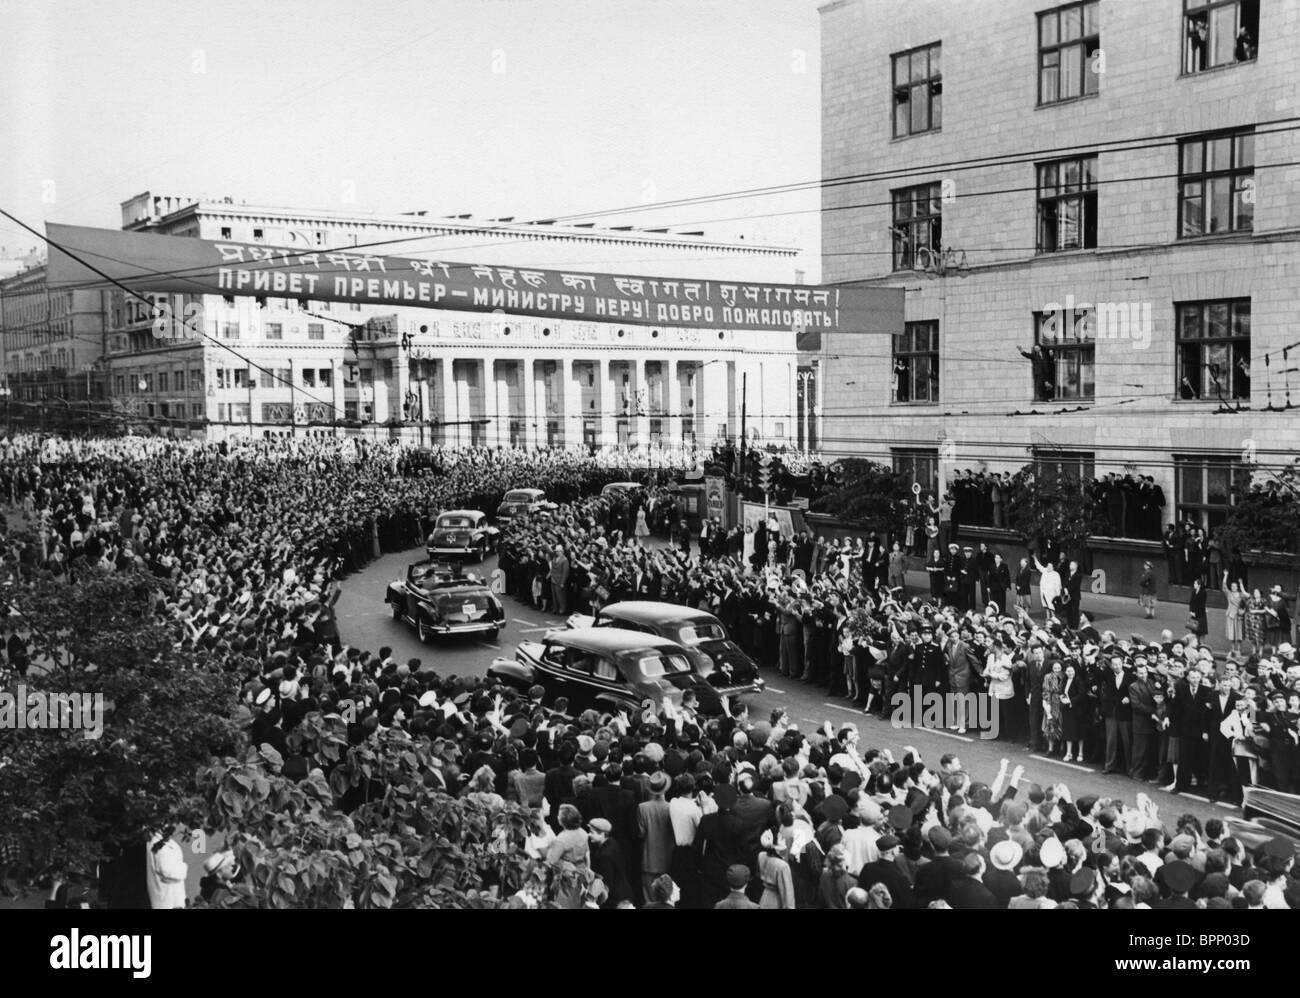 Jawaharlal Nehru visit to Soviet Union, 1955 - Stock Image